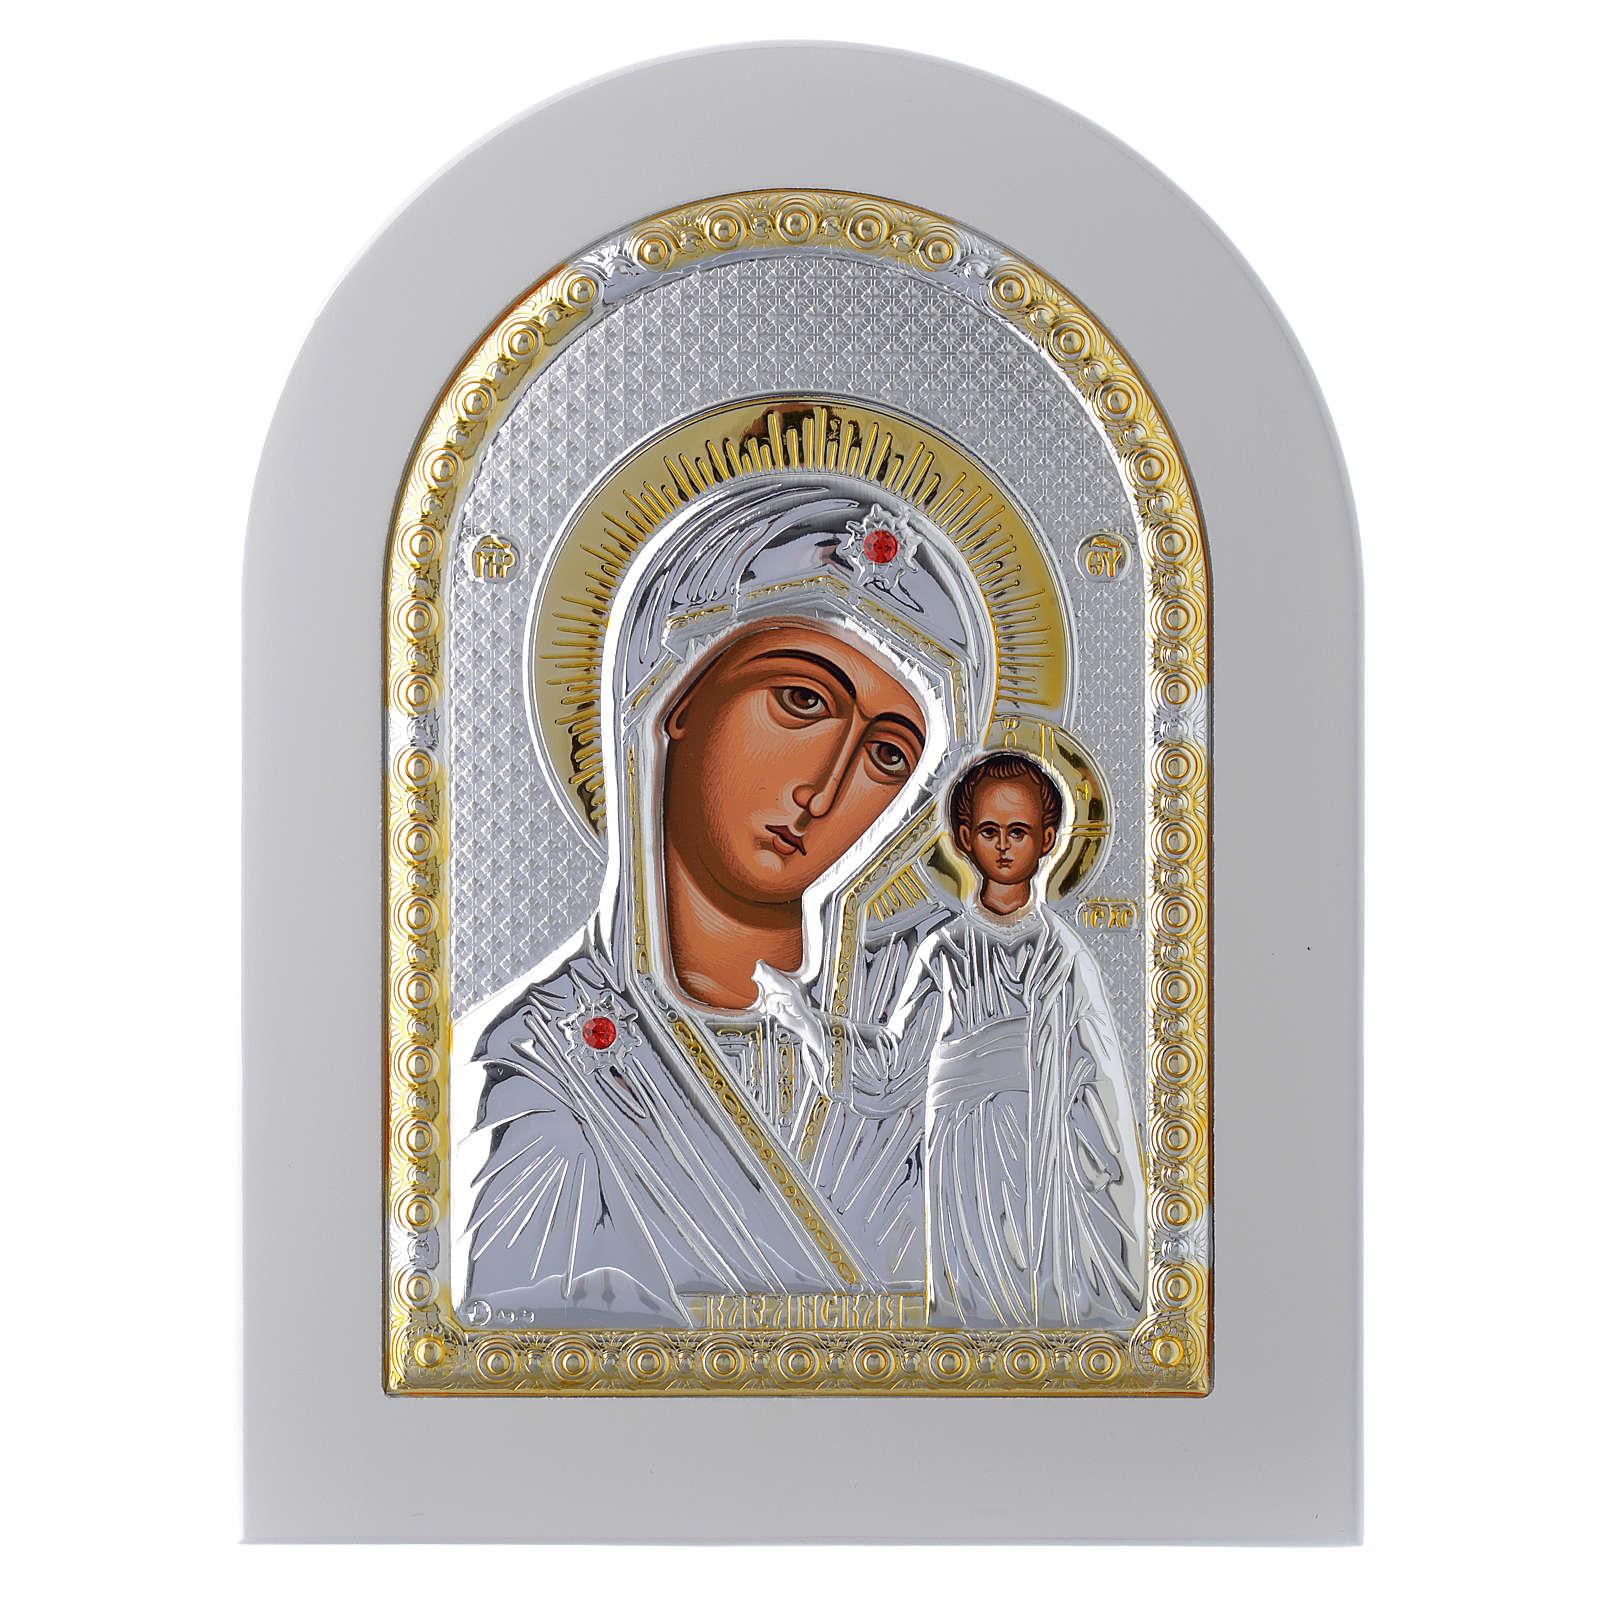 Icona Madonna di Kazan Famiglia 18x14 cm argento 925 finiture dorate 4